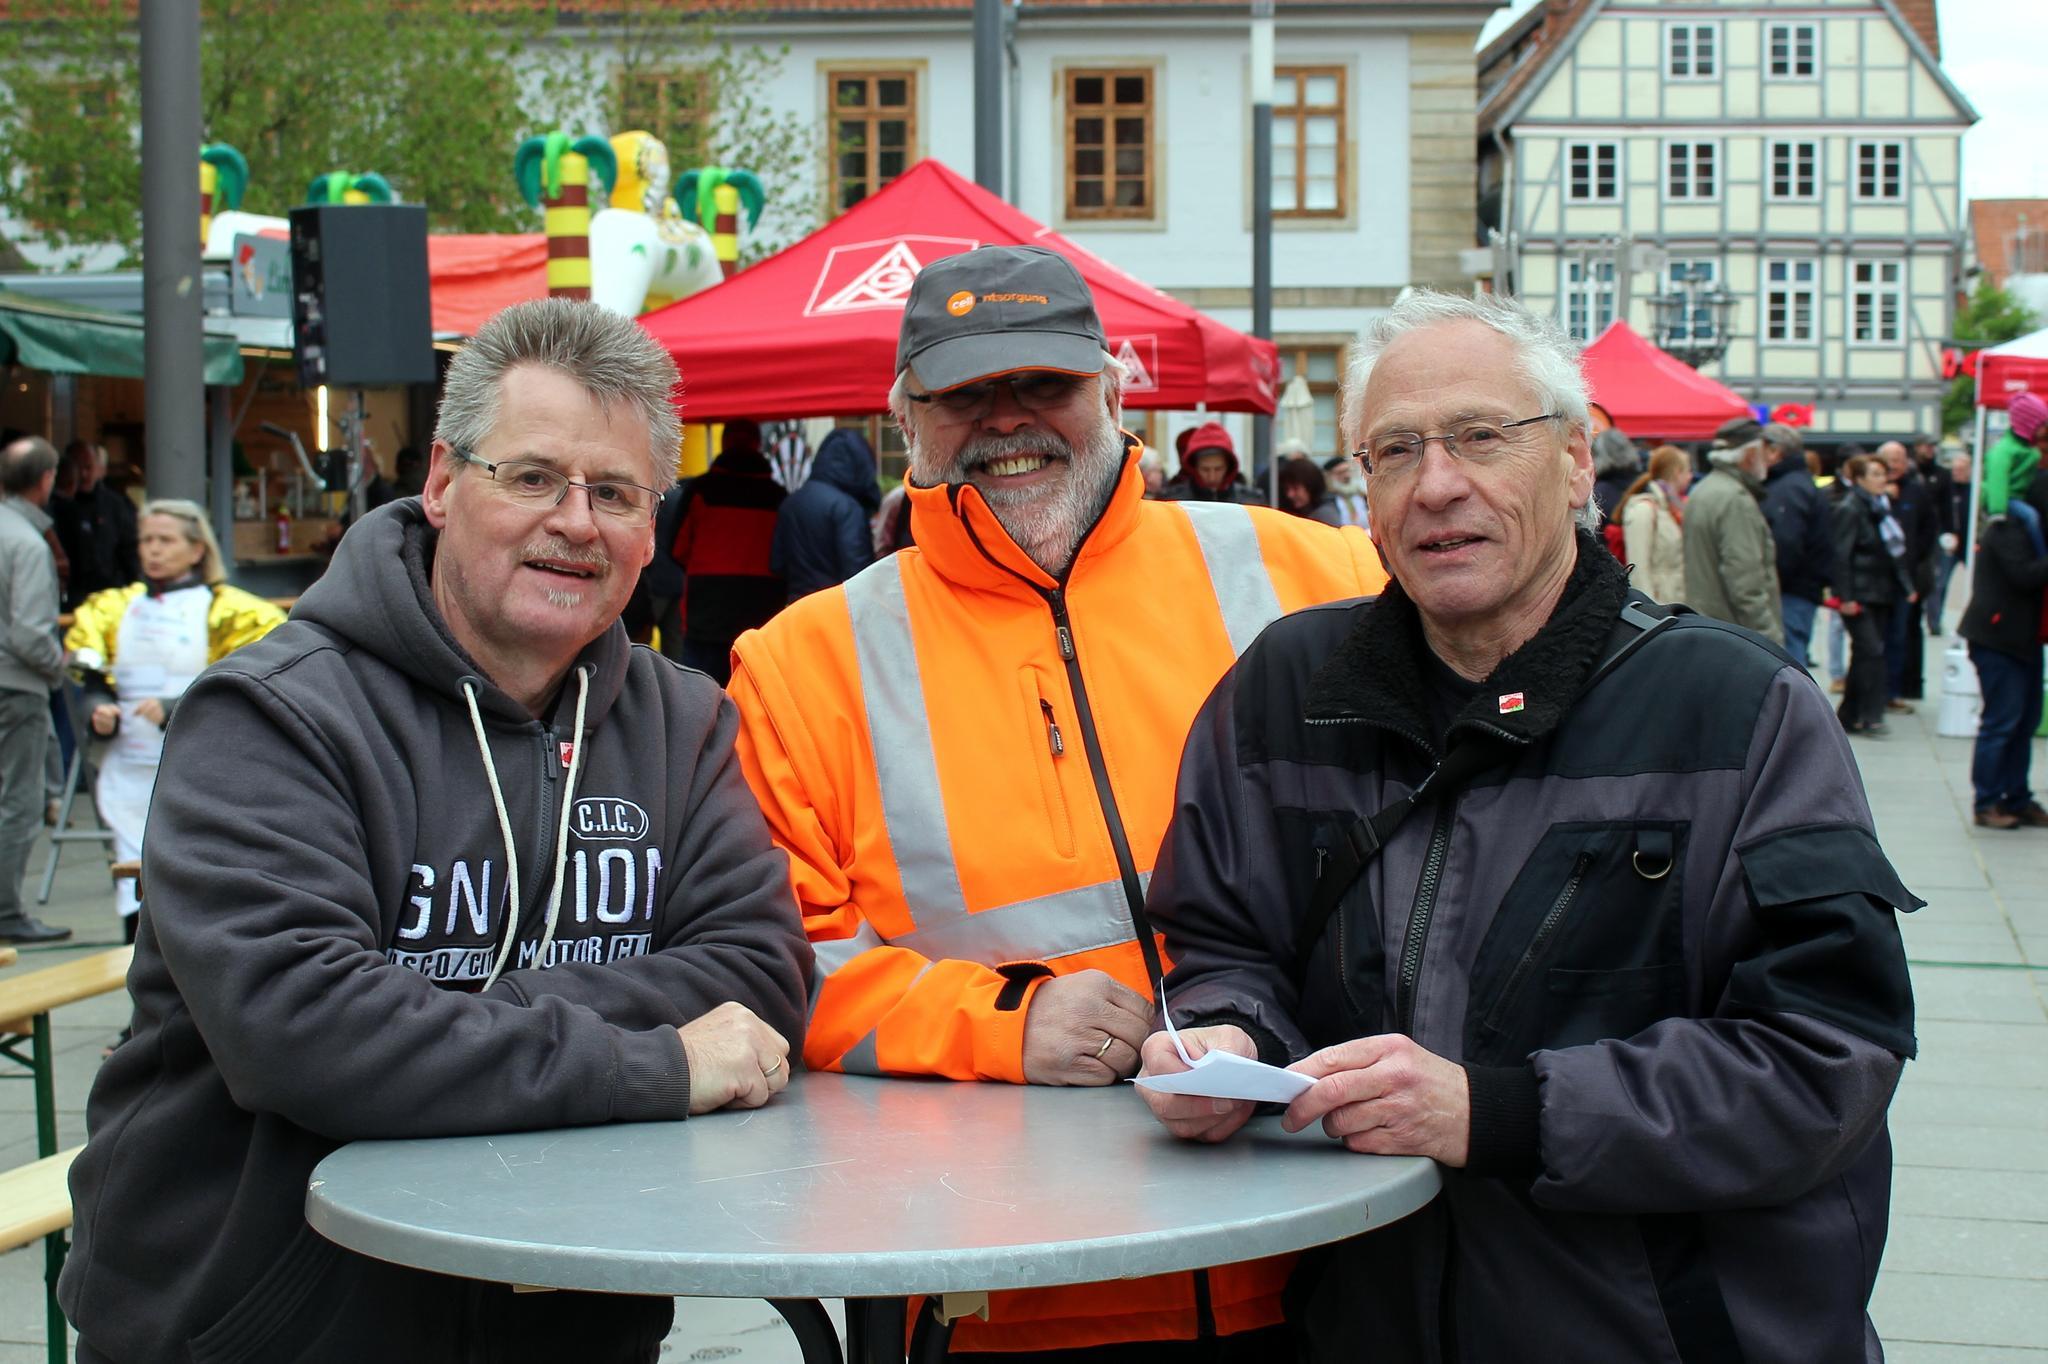 #1.Mai Celle 2018